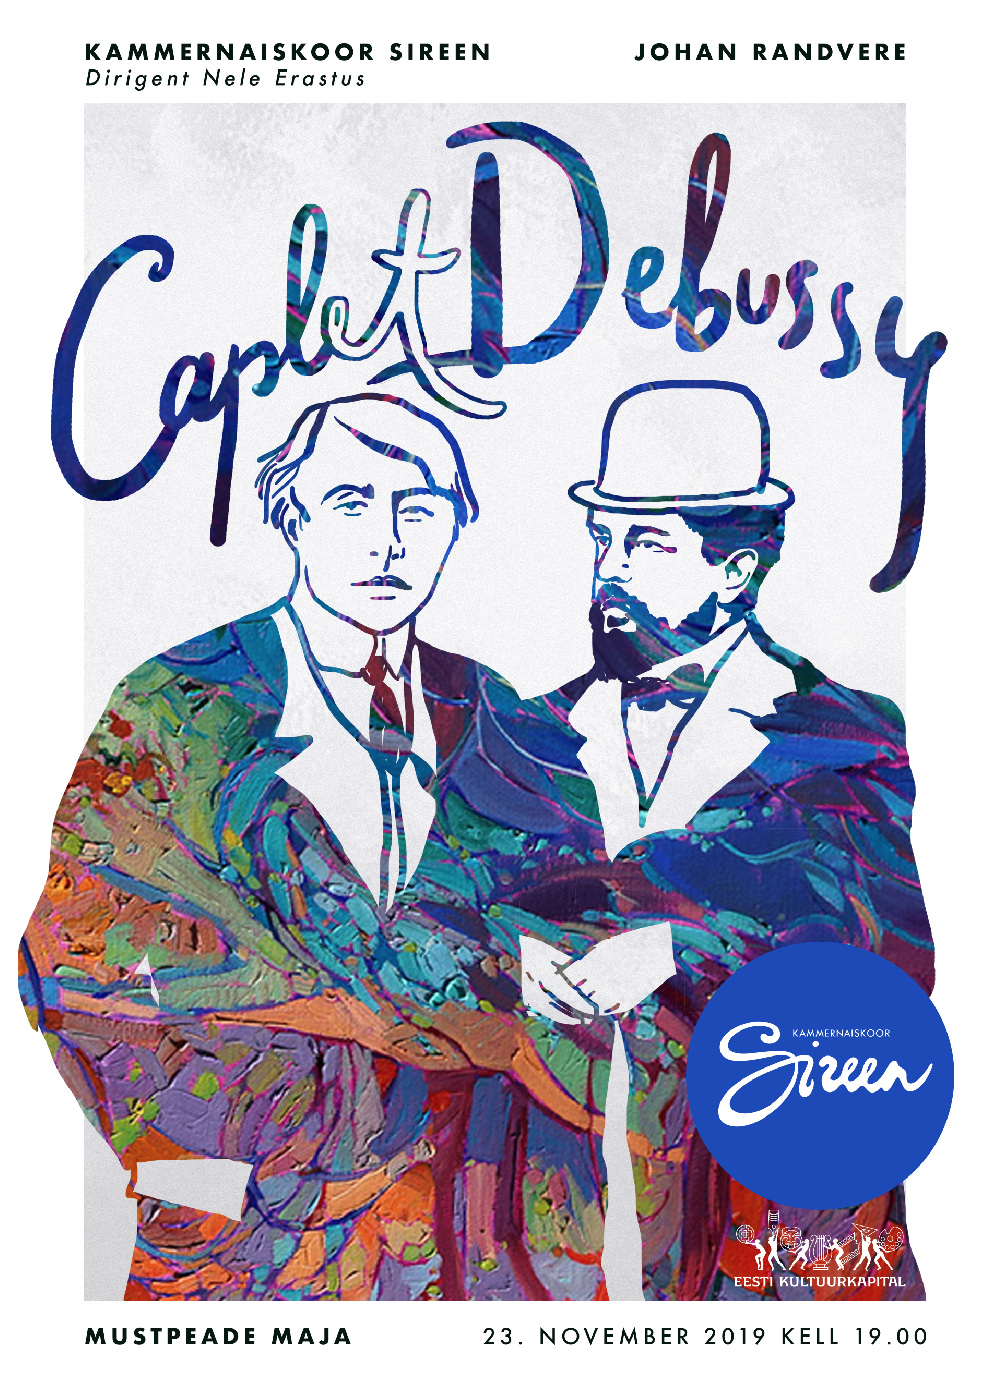 Caplet. Debussy - Kammernaiskoor Sireen ja Johan Randvere